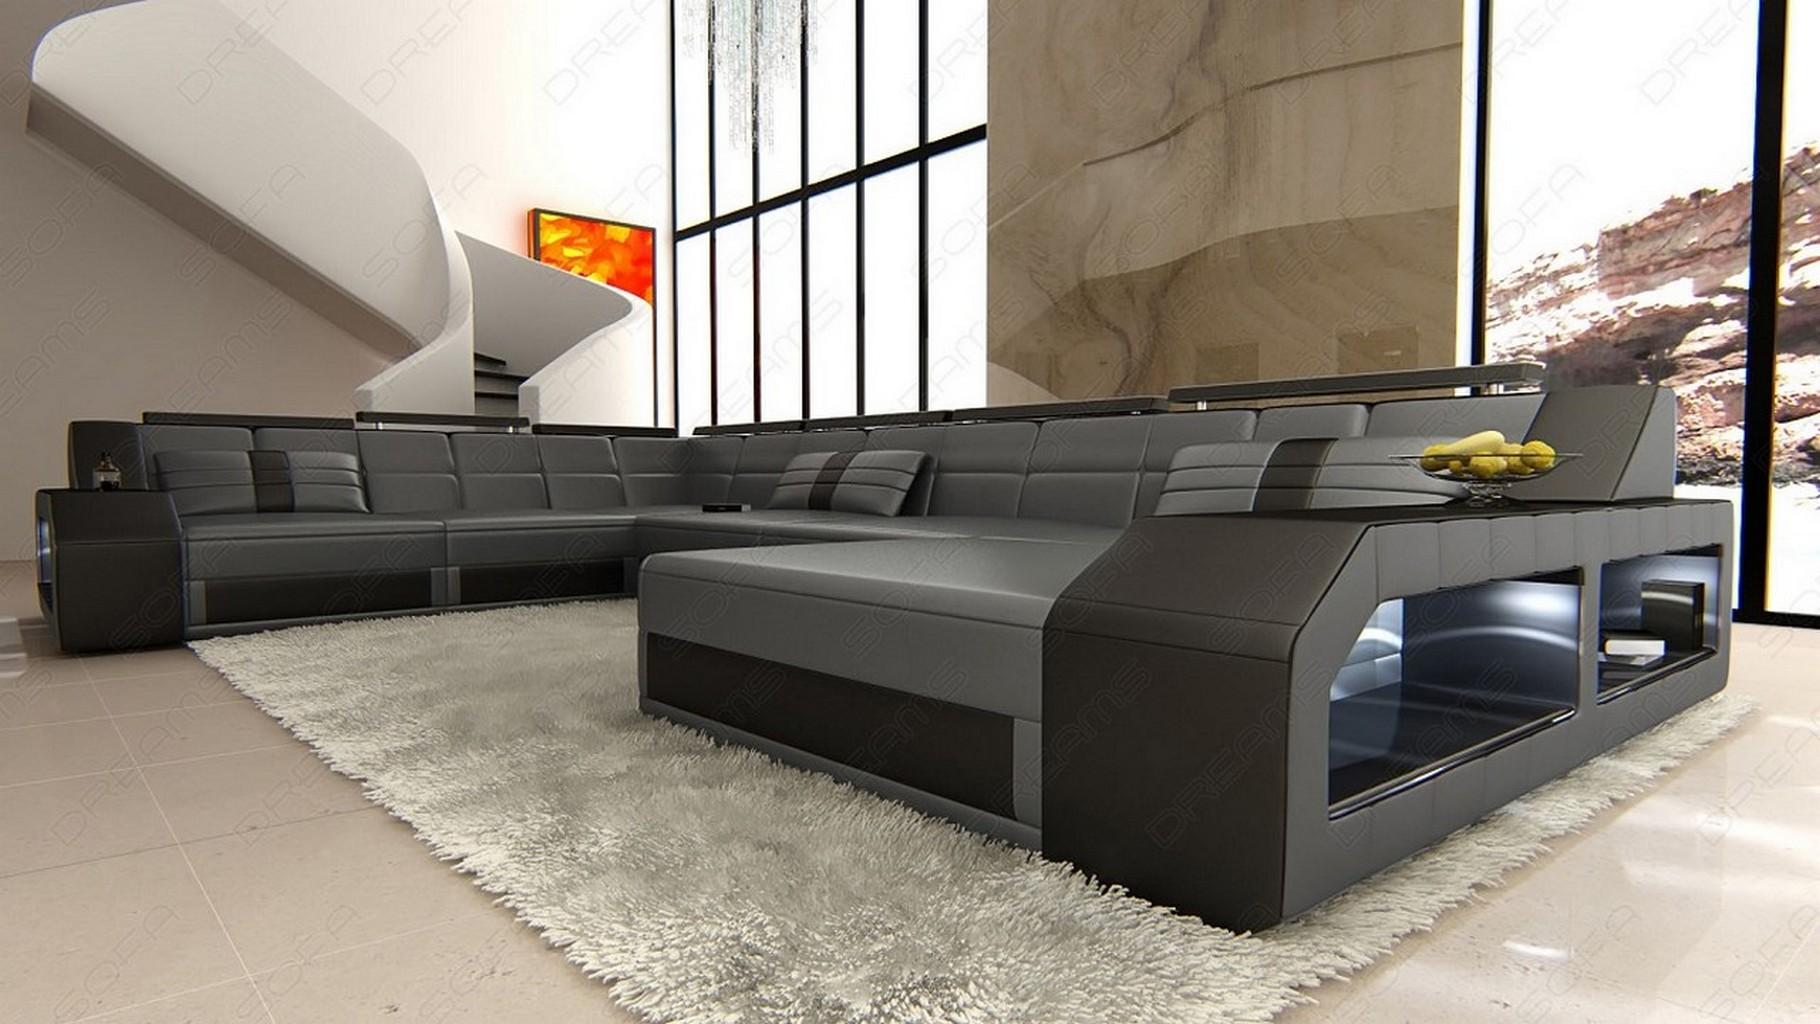 eckcouch design sofa matera grau schwarz ottomane led beleuchtung lagerware ebay. Black Bedroom Furniture Sets. Home Design Ideas